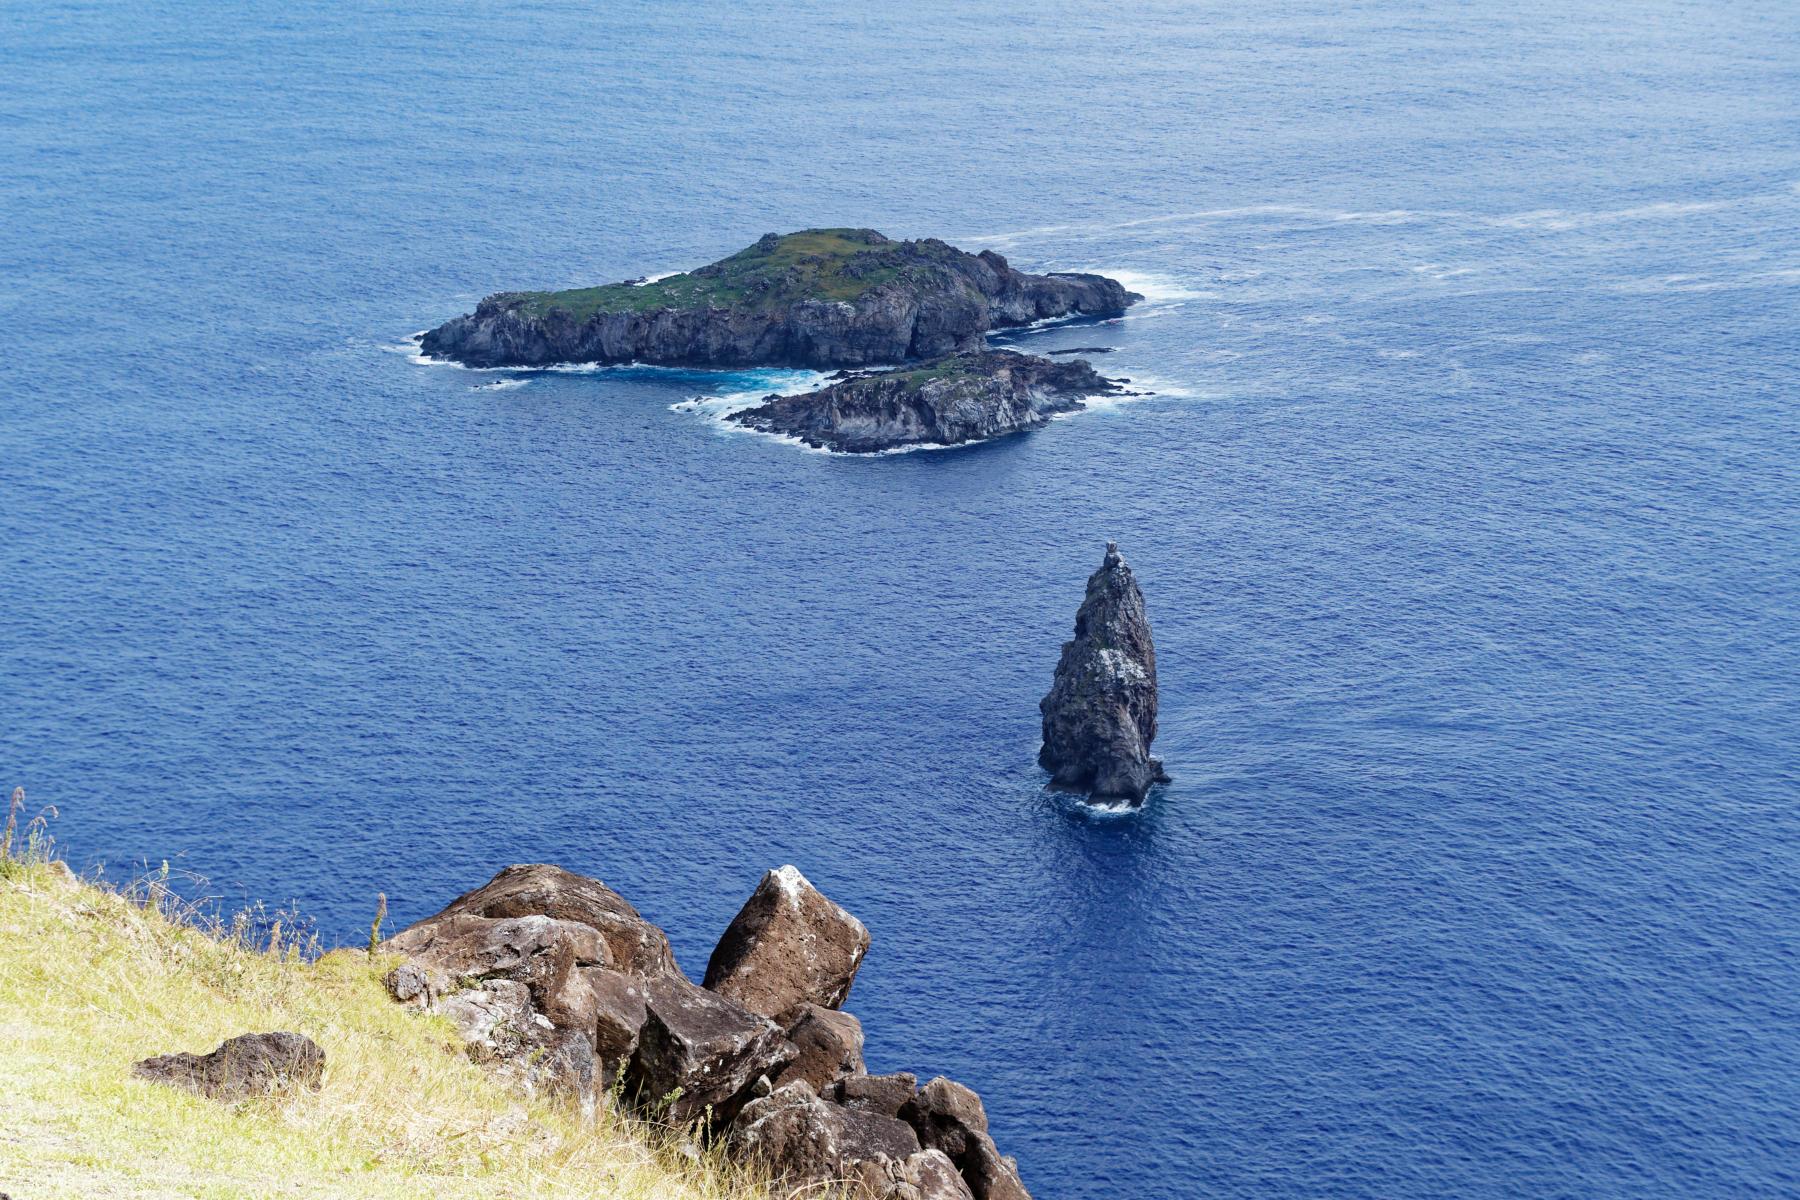 The Birdman islets